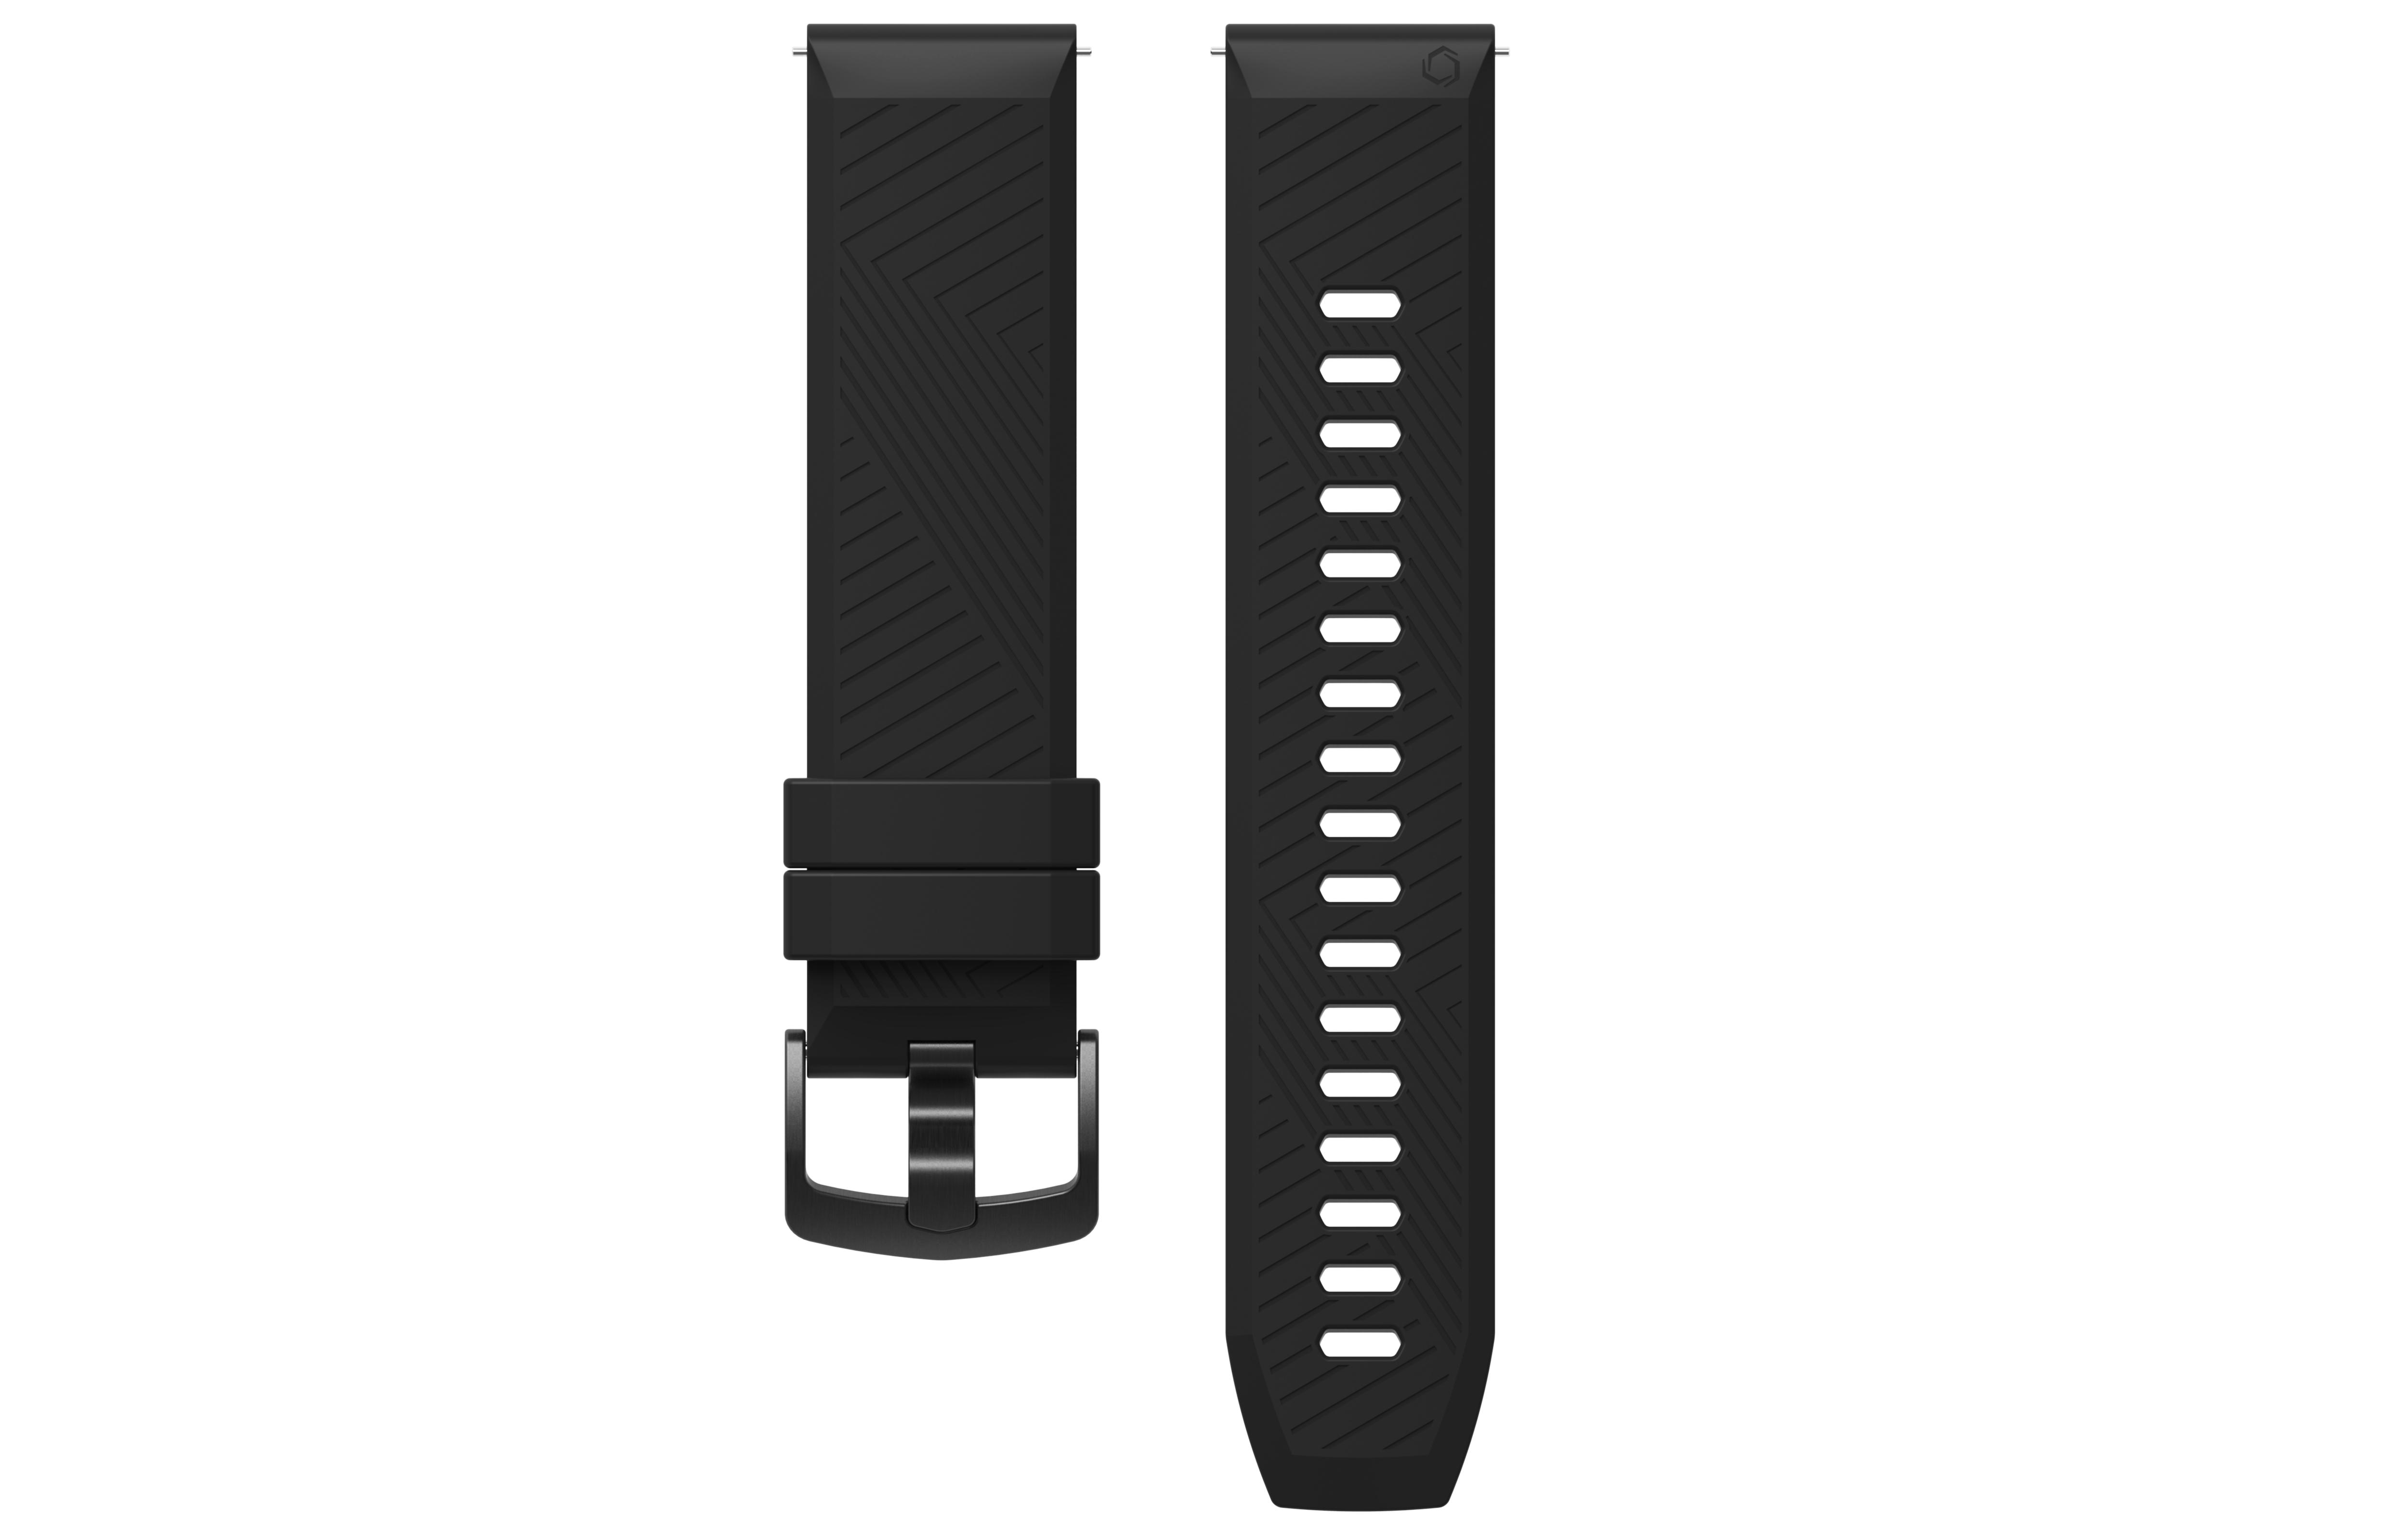 APEX - 42mm Watch Band BLACK